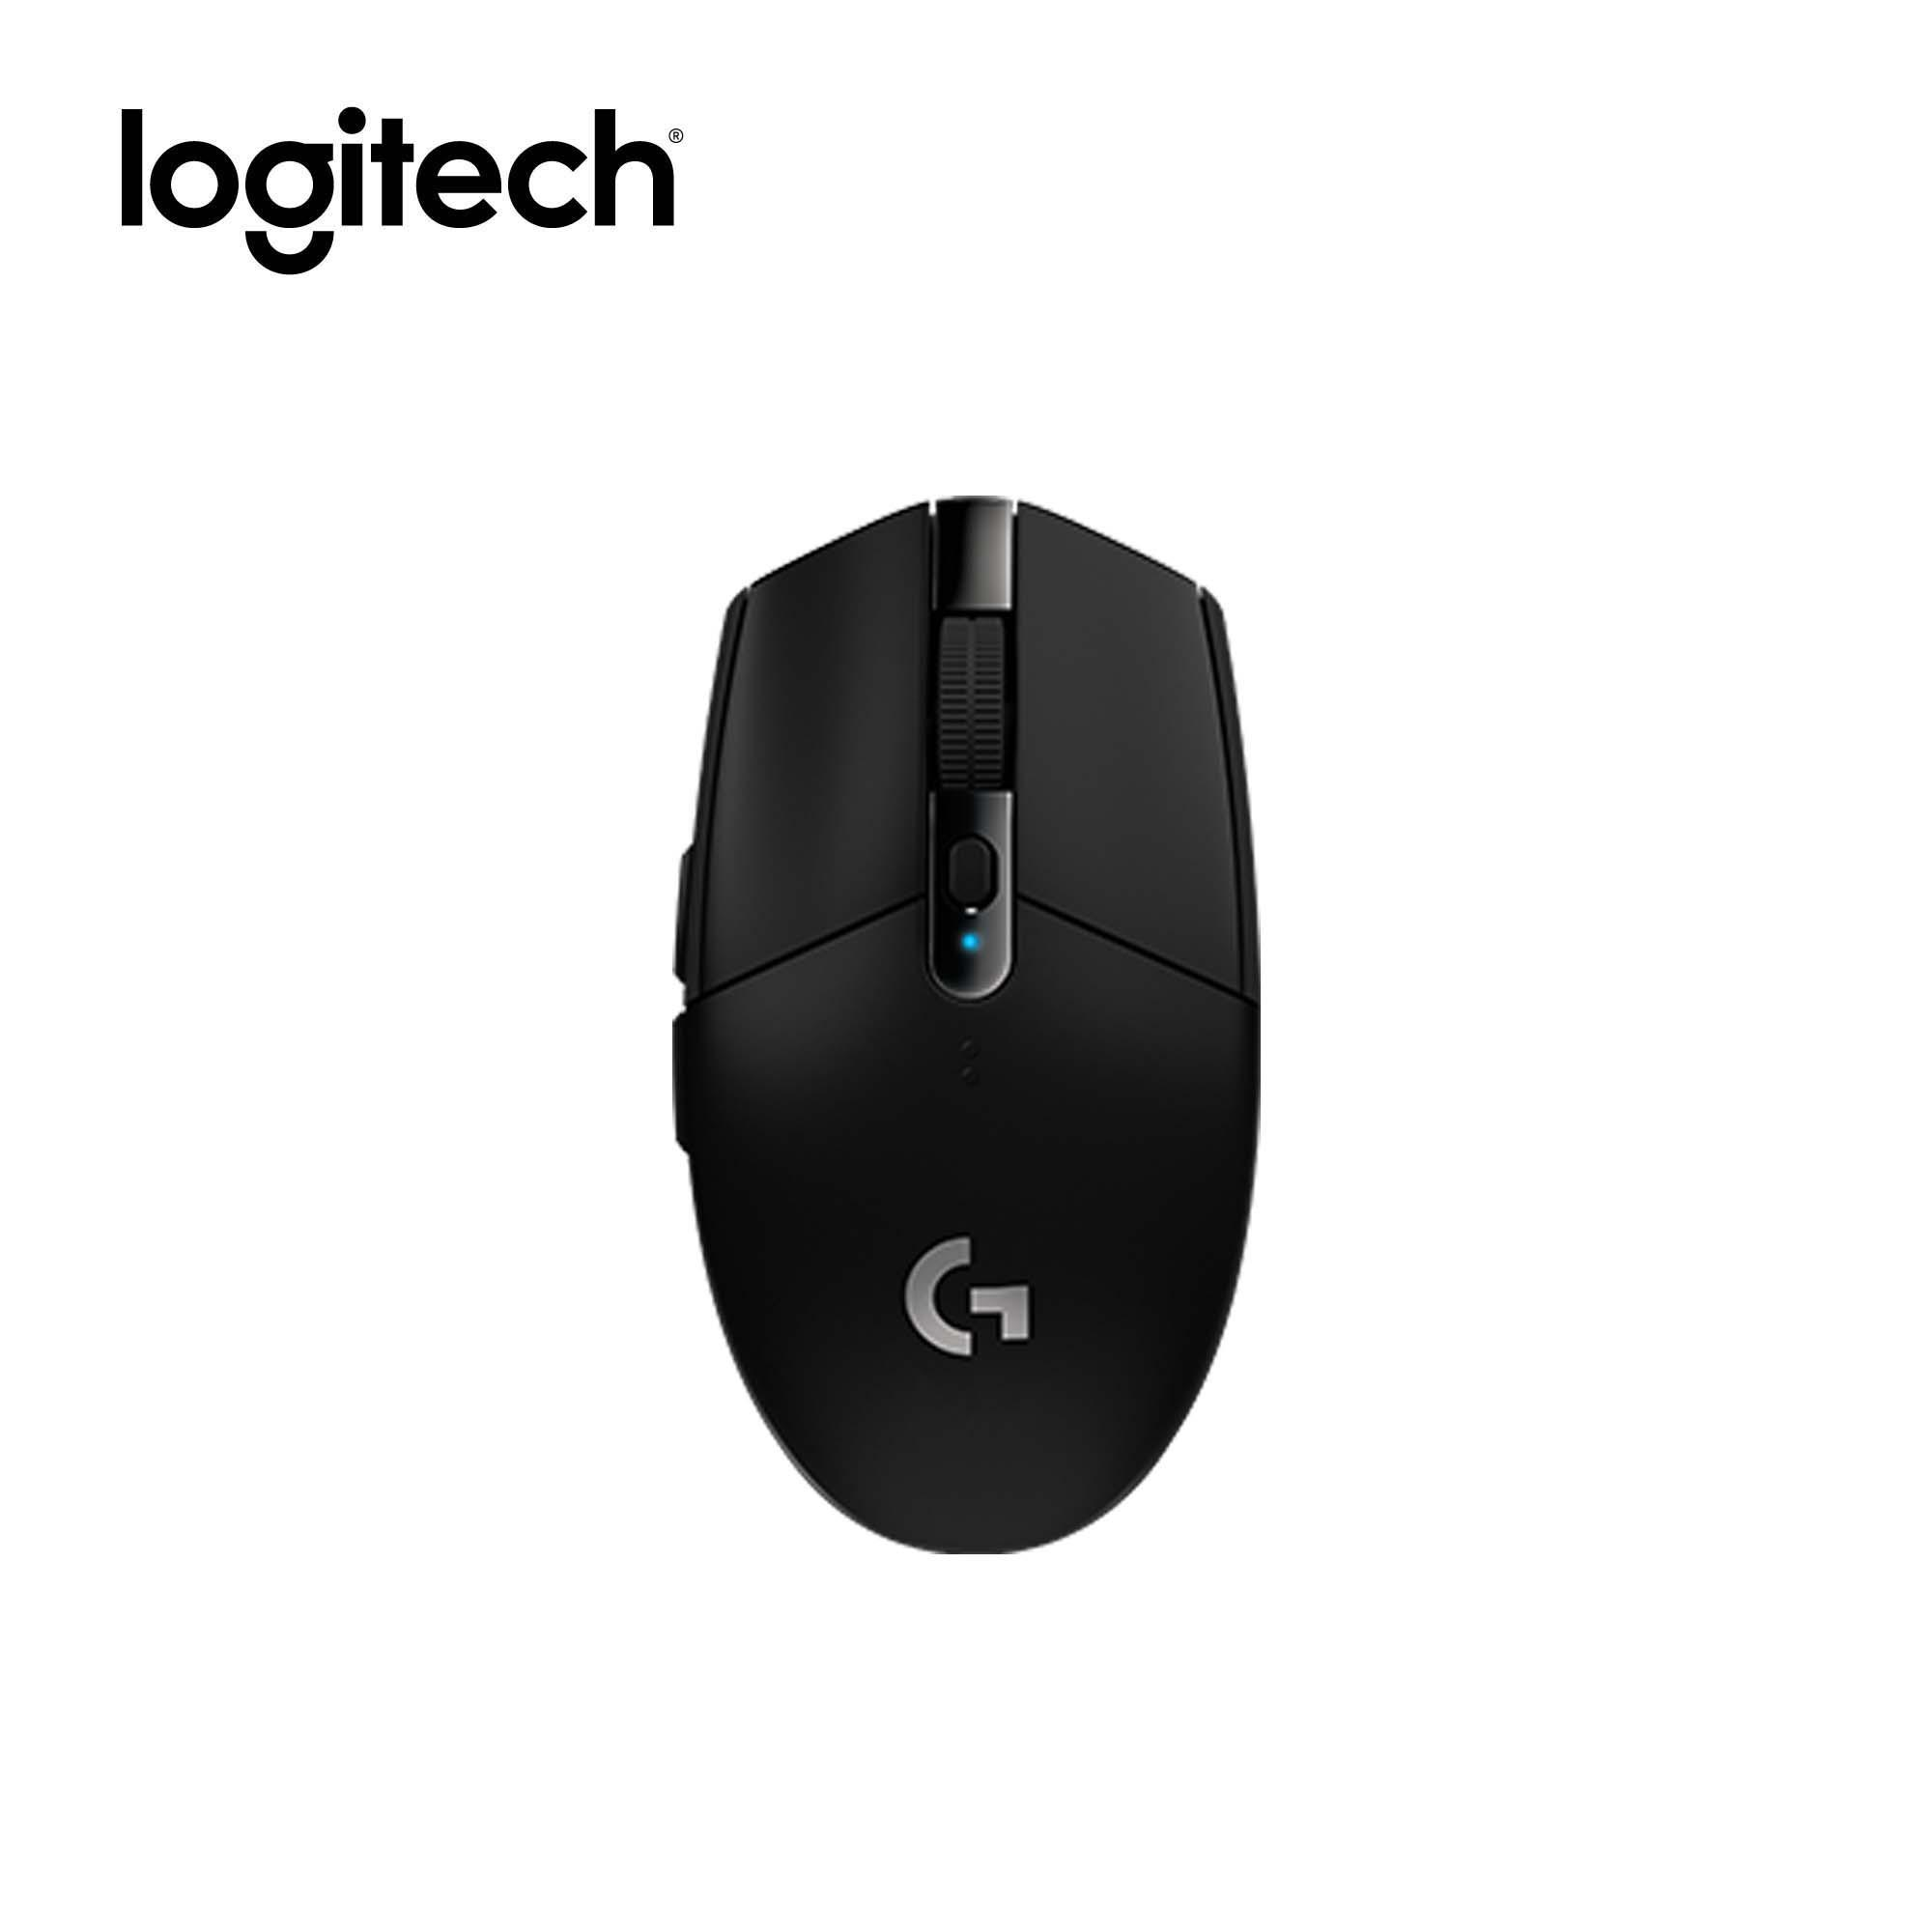 Logitech G304 Next-Generation Lightspeed Wireless Gaming Mouse,Hero Sensor max 12,000 DPI,